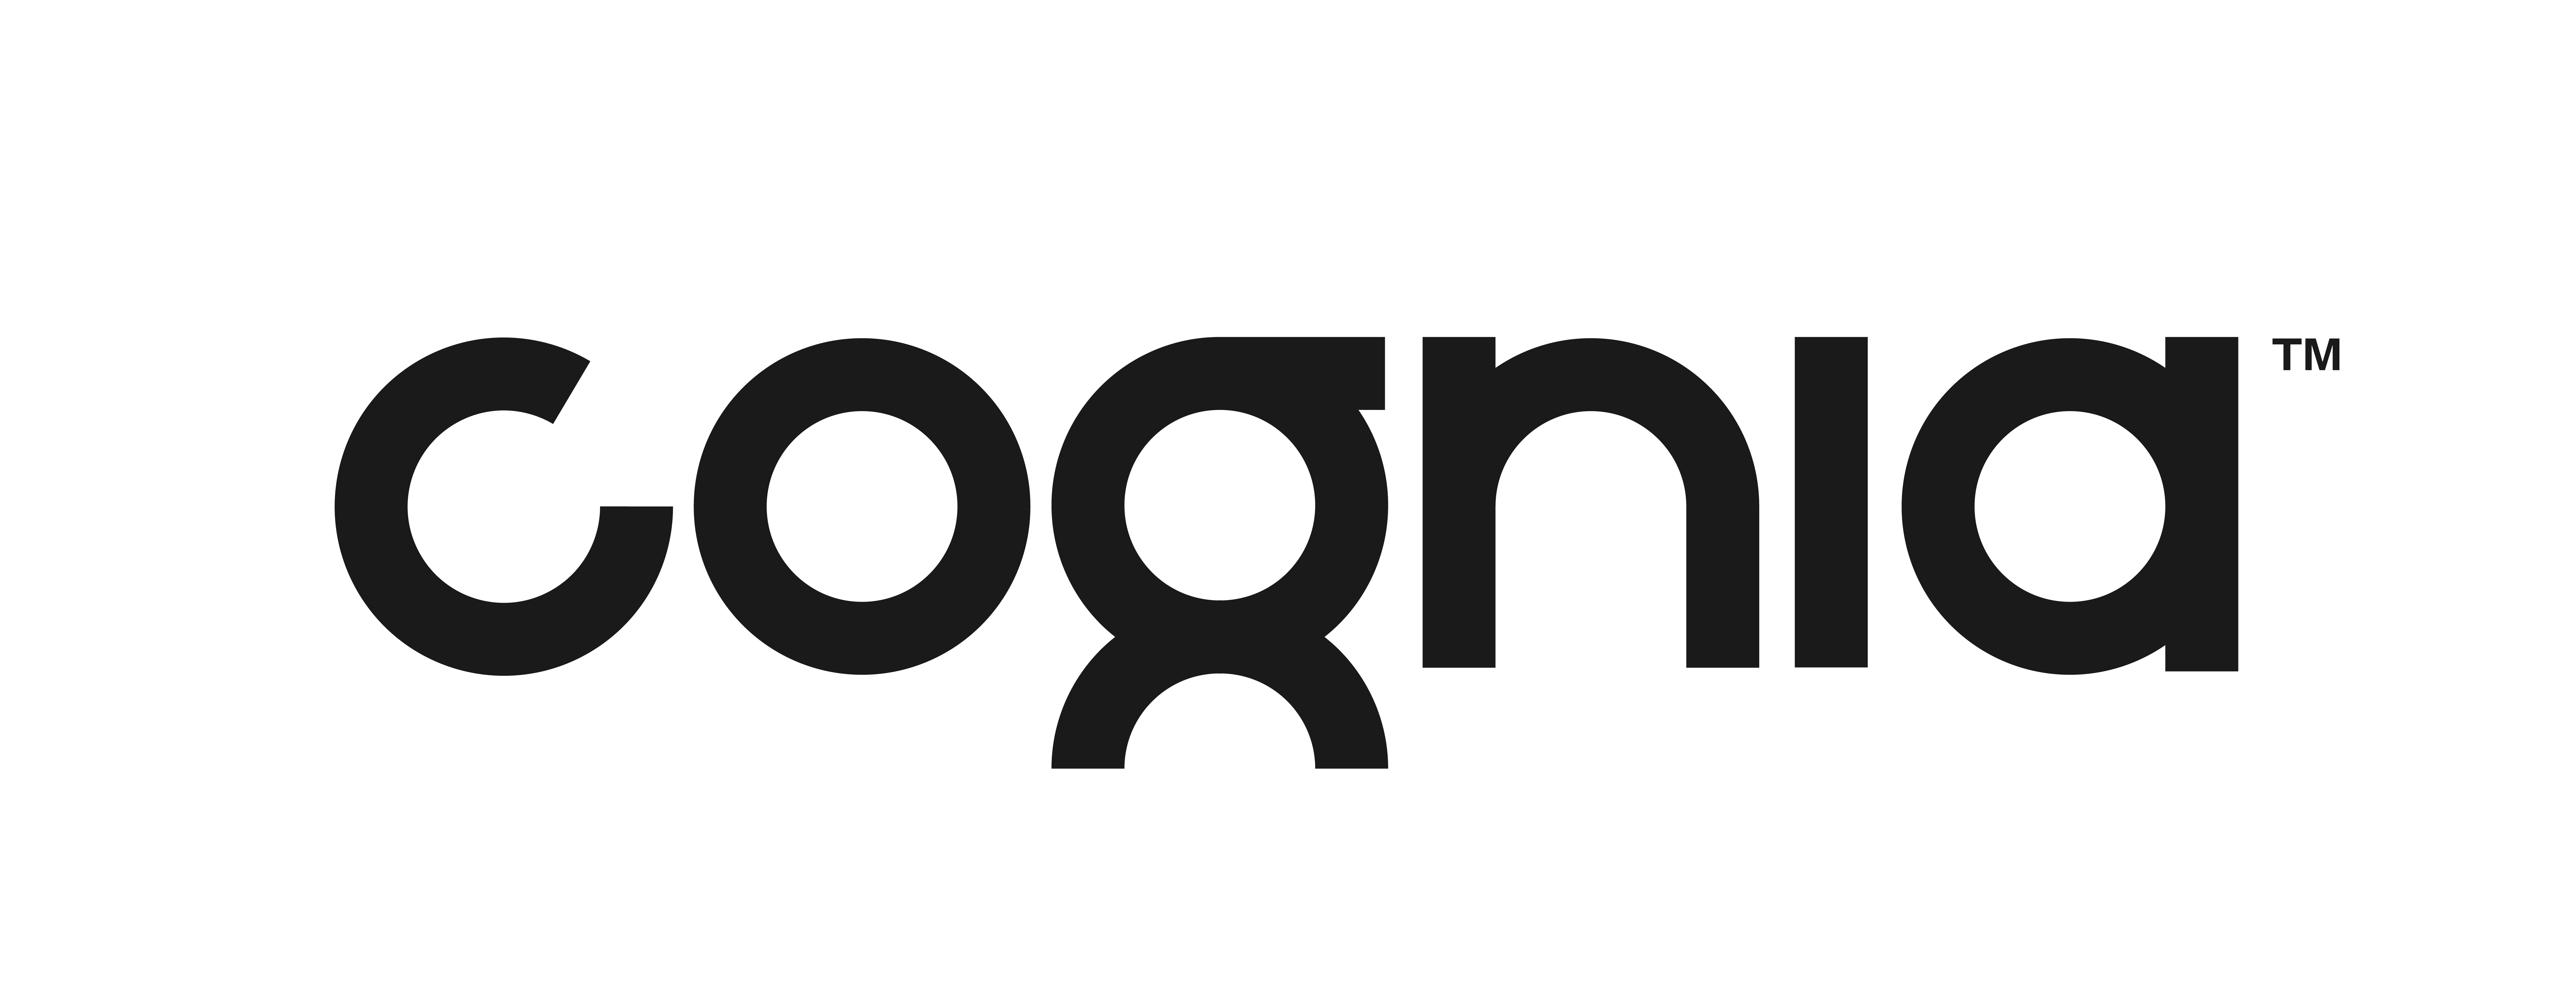 cognia_rgb_logotype_reverseddot_redbg